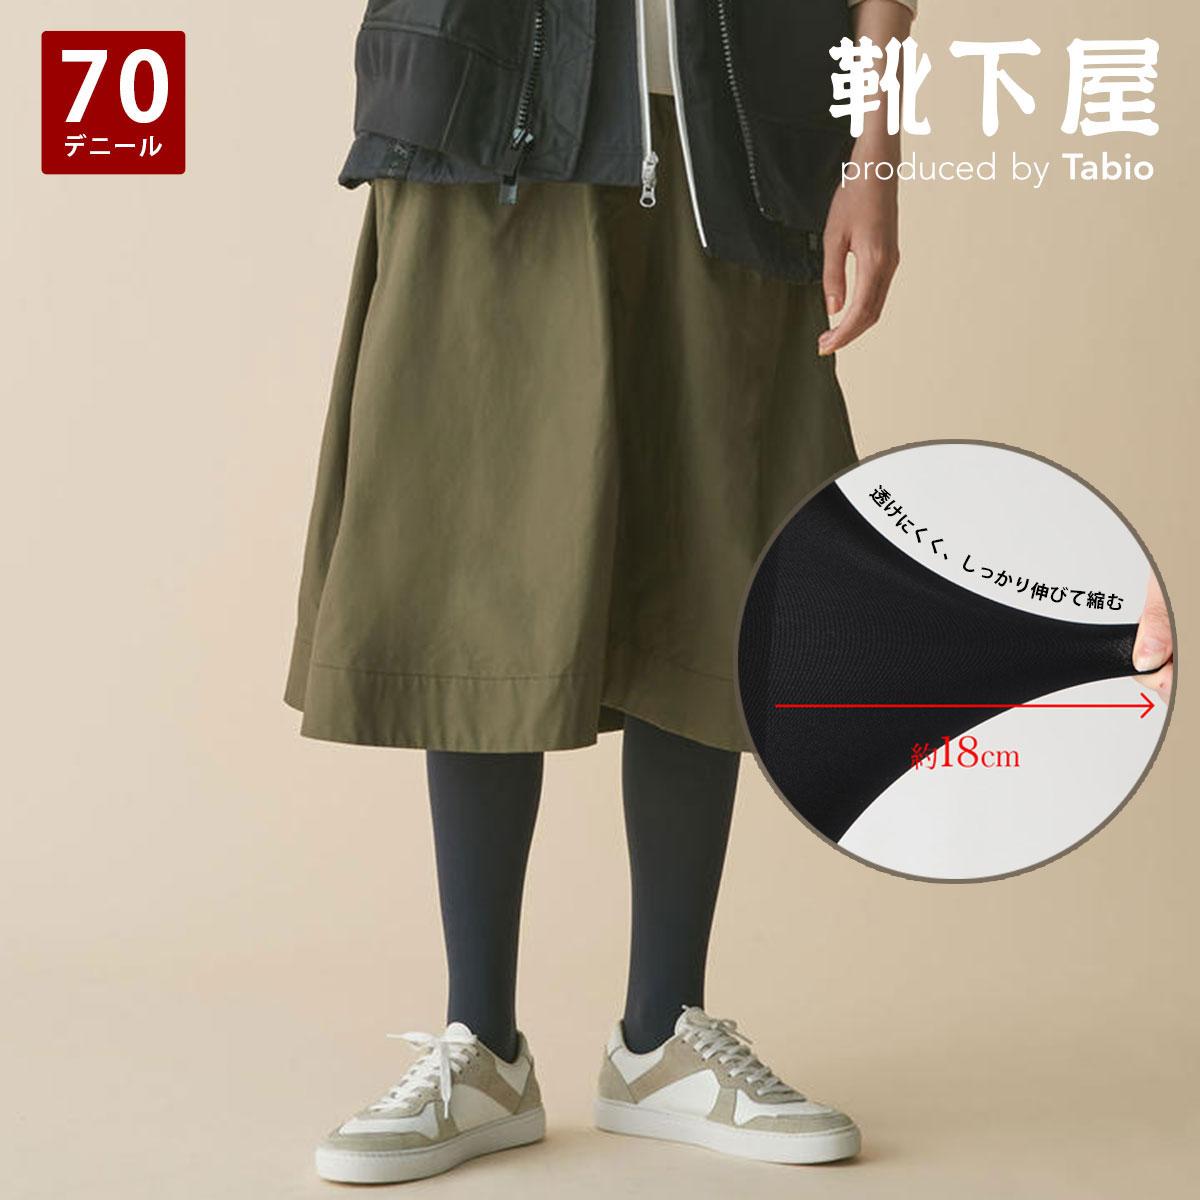 【Tabio】 ◆K.K closet掲載商品◆グレードアップ◆70デニールタイツ / 靴下屋 靴下 タビオ くつ下 レディース 日本製